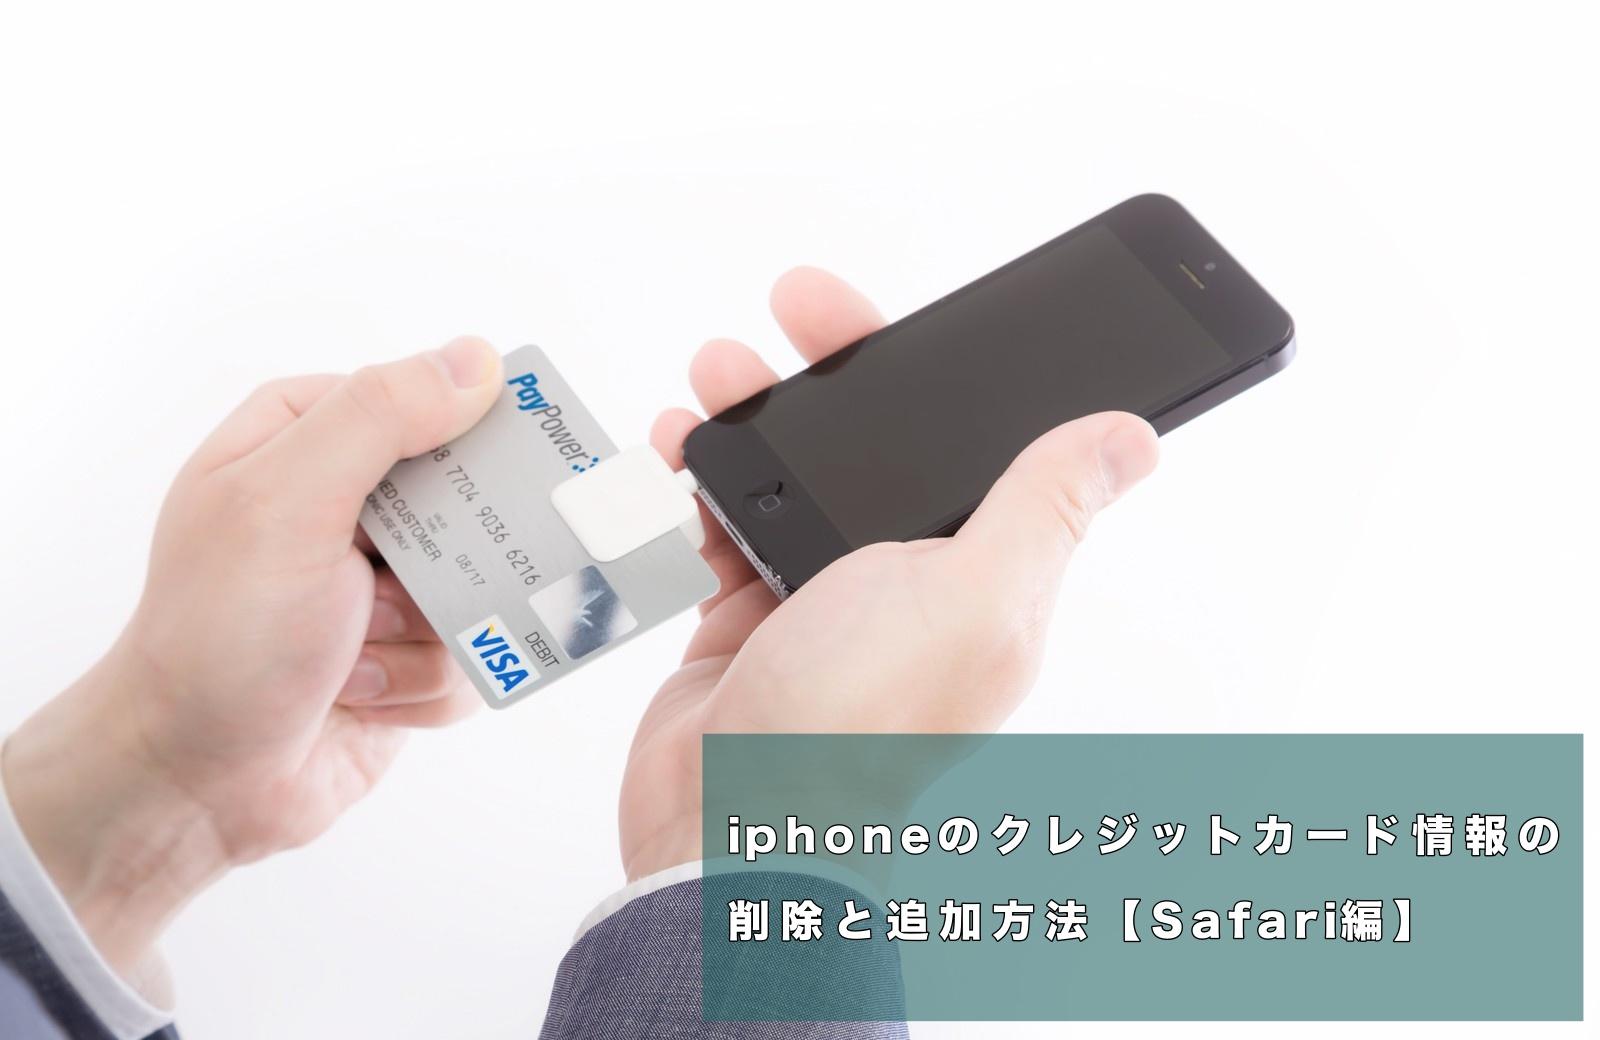 iphoneのクレジットカード情報の削除と追加方法【Safari編】